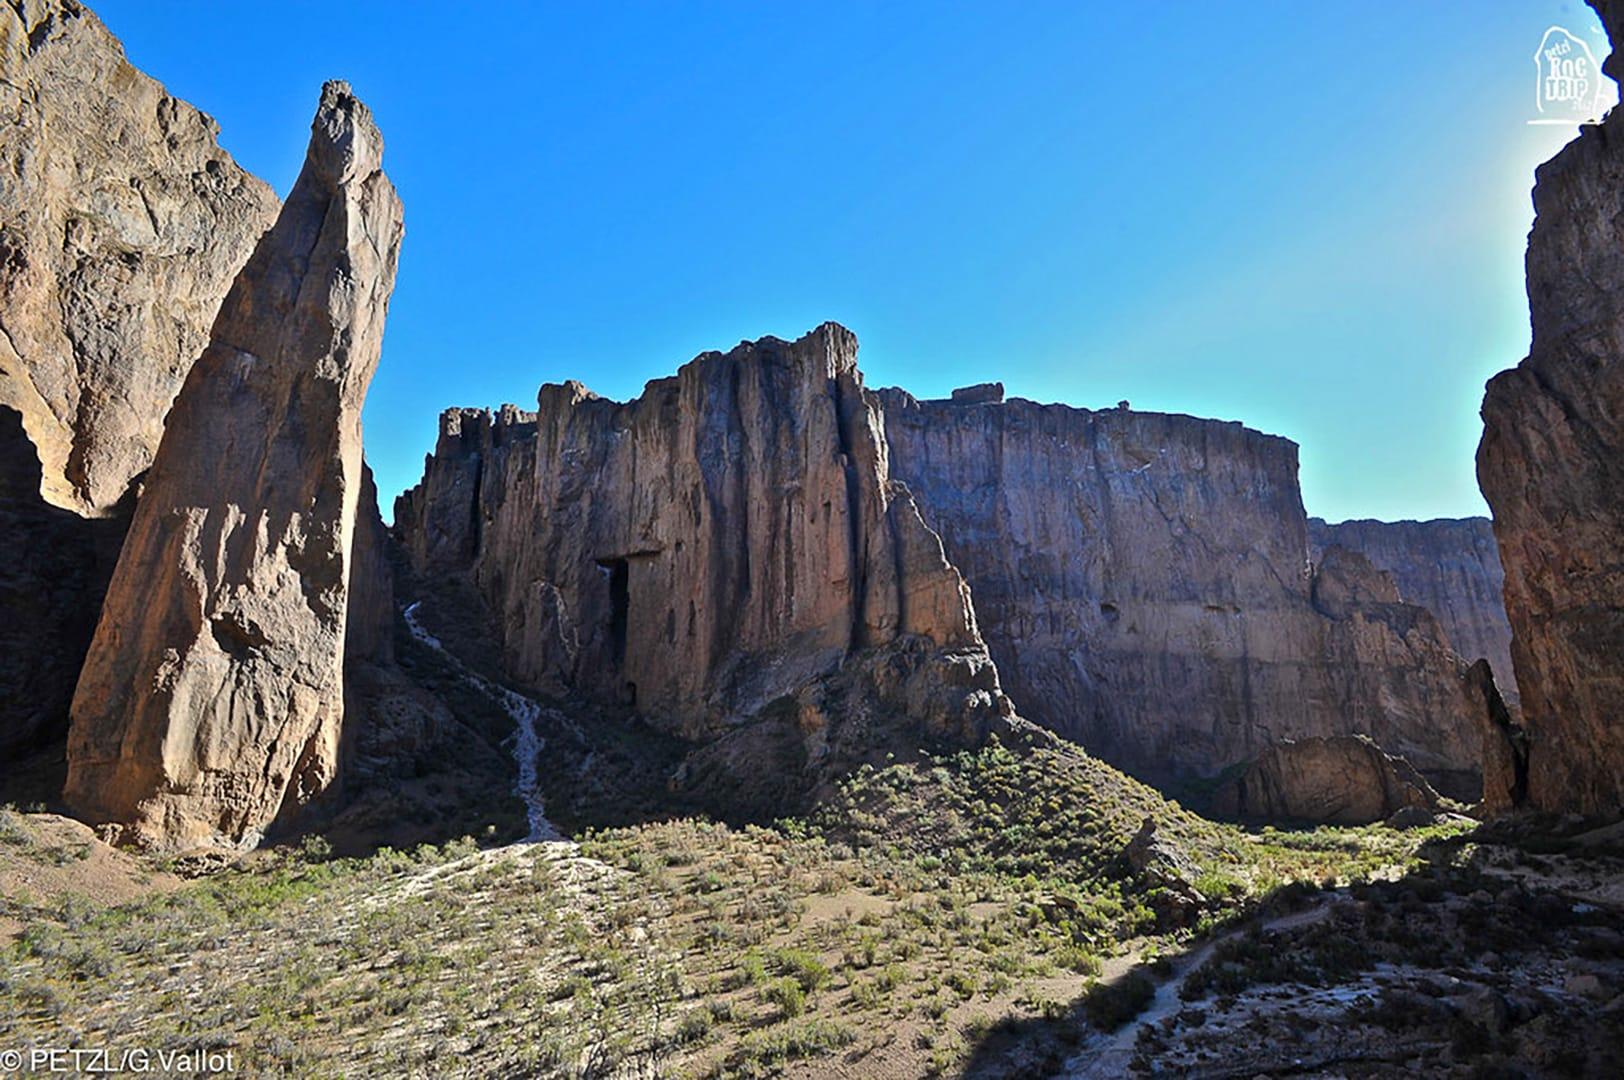 Petzl RocTrip Argentina 2012 - La Buitrera Canyon - Piedra Parada - ©Guillaume Vallot